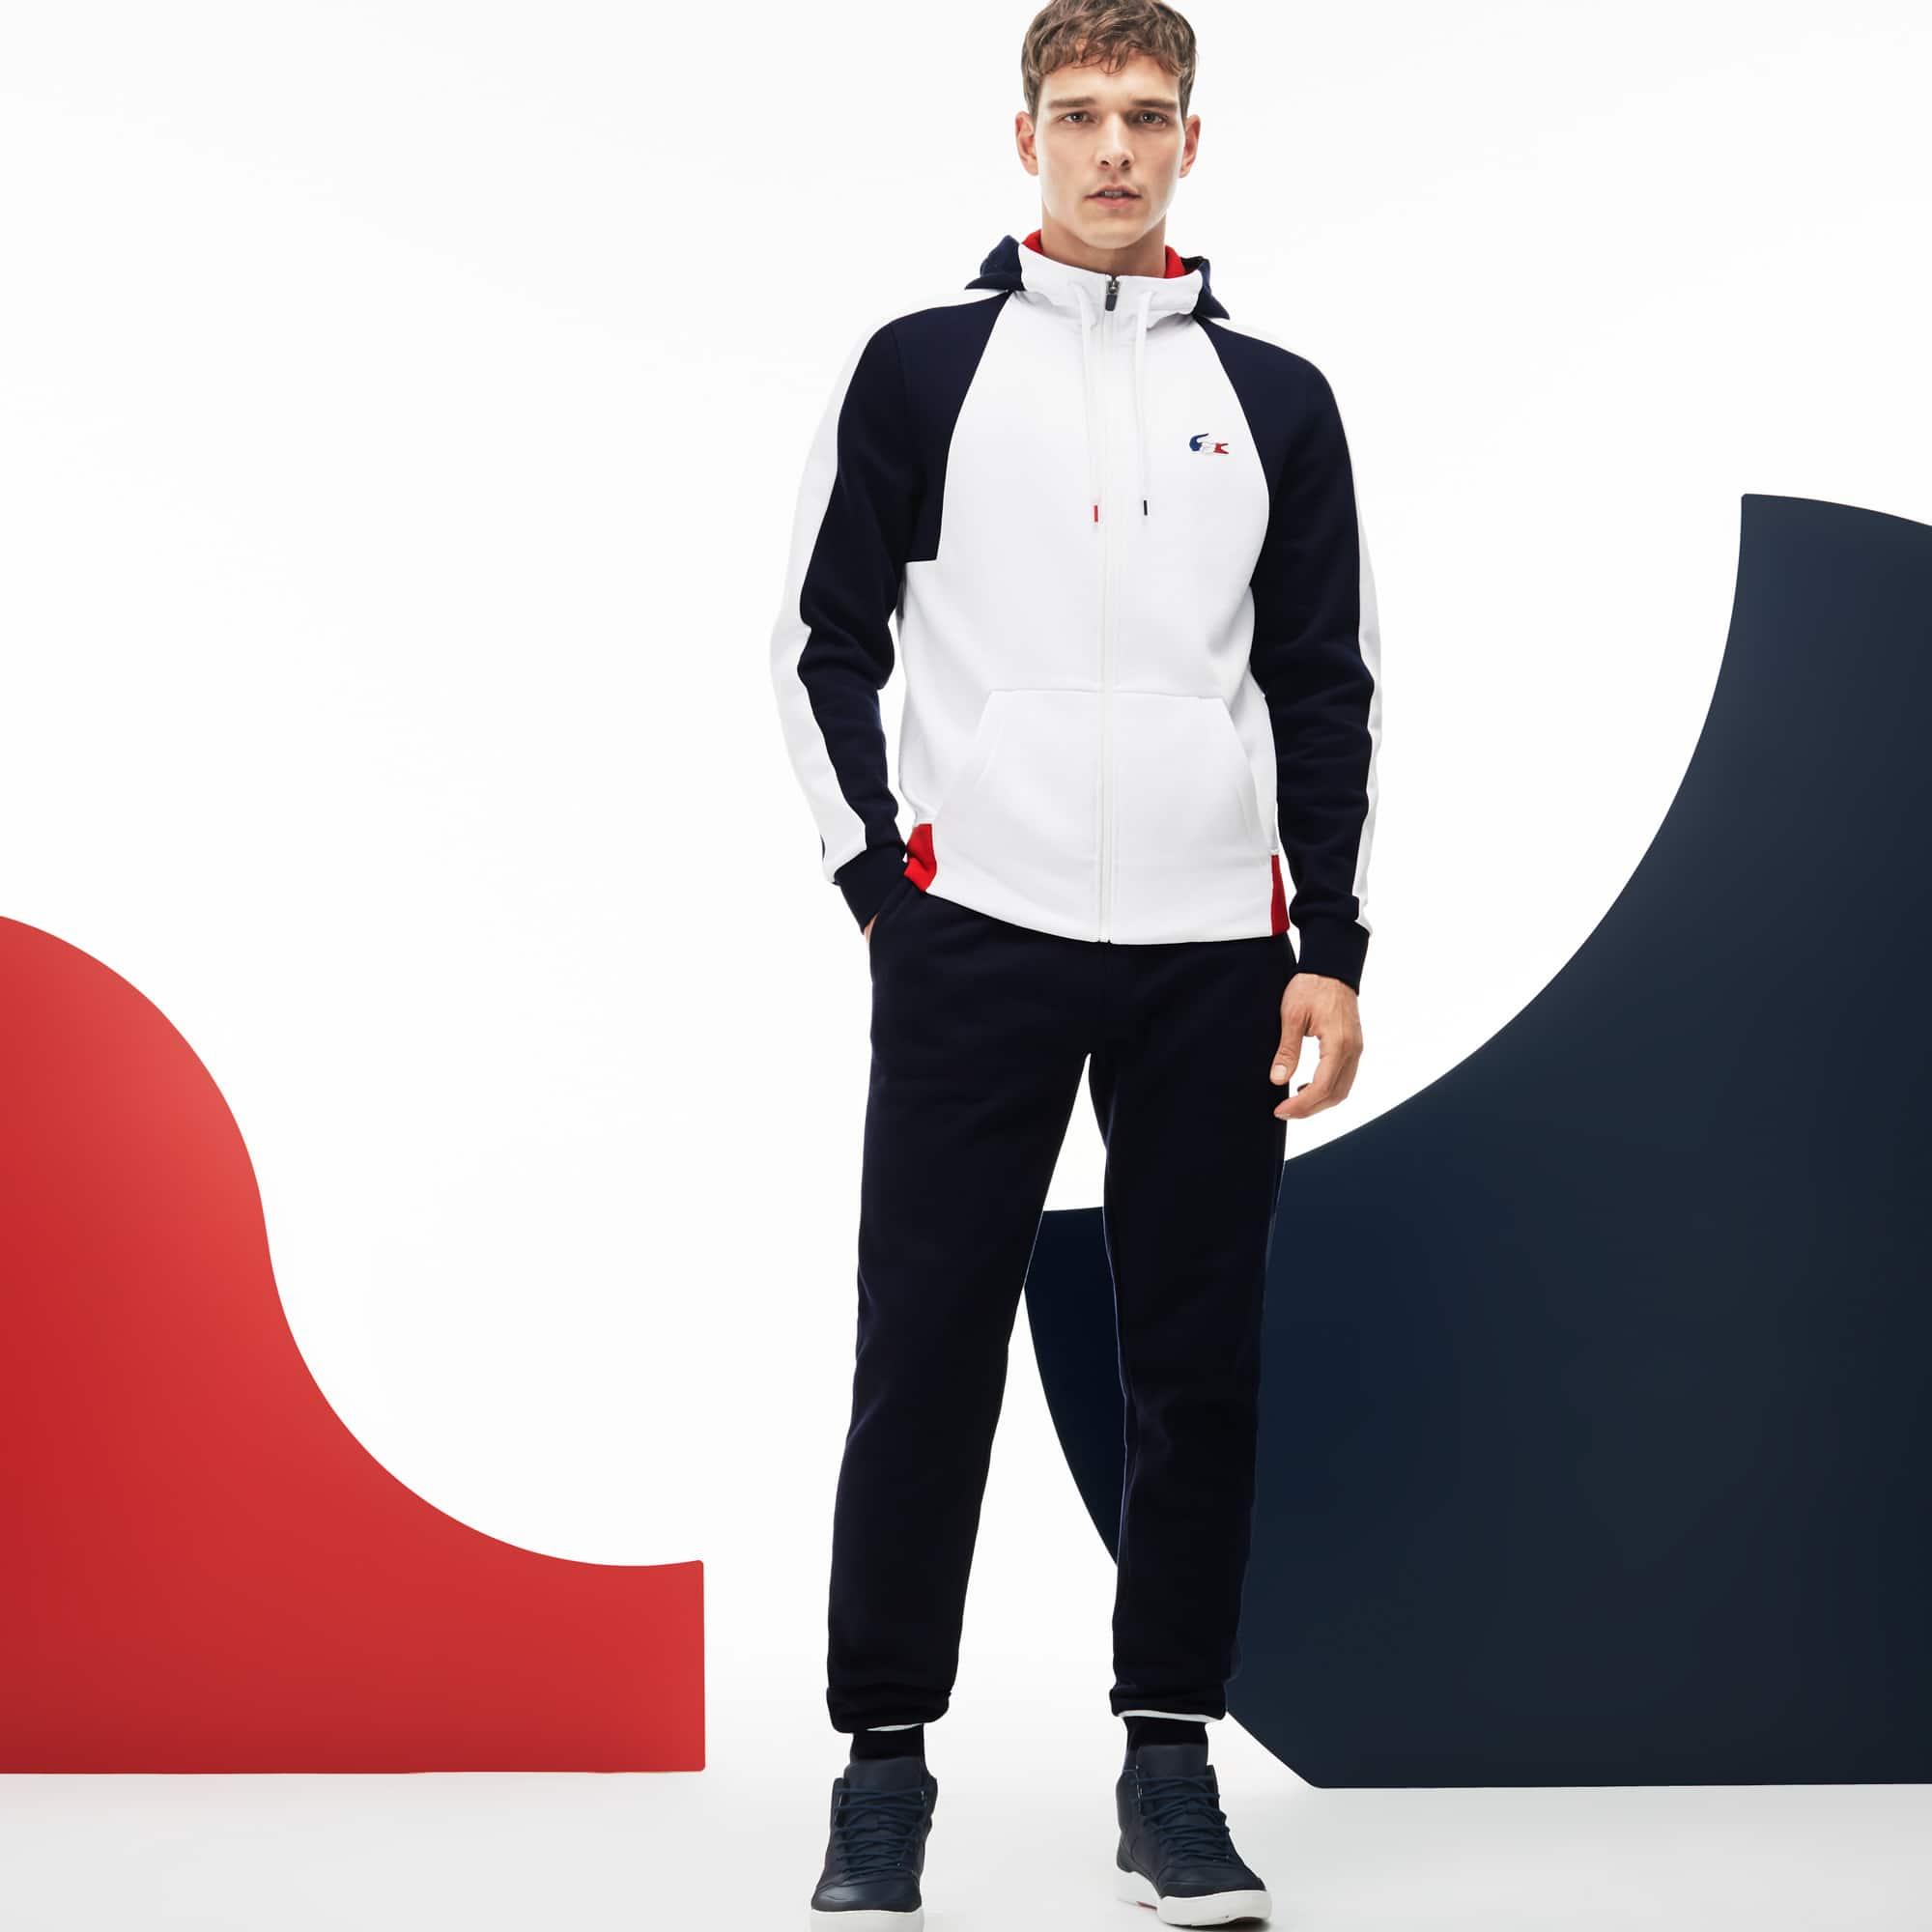 Men's French Sporting Spirit Edition Fleece Sweatpants